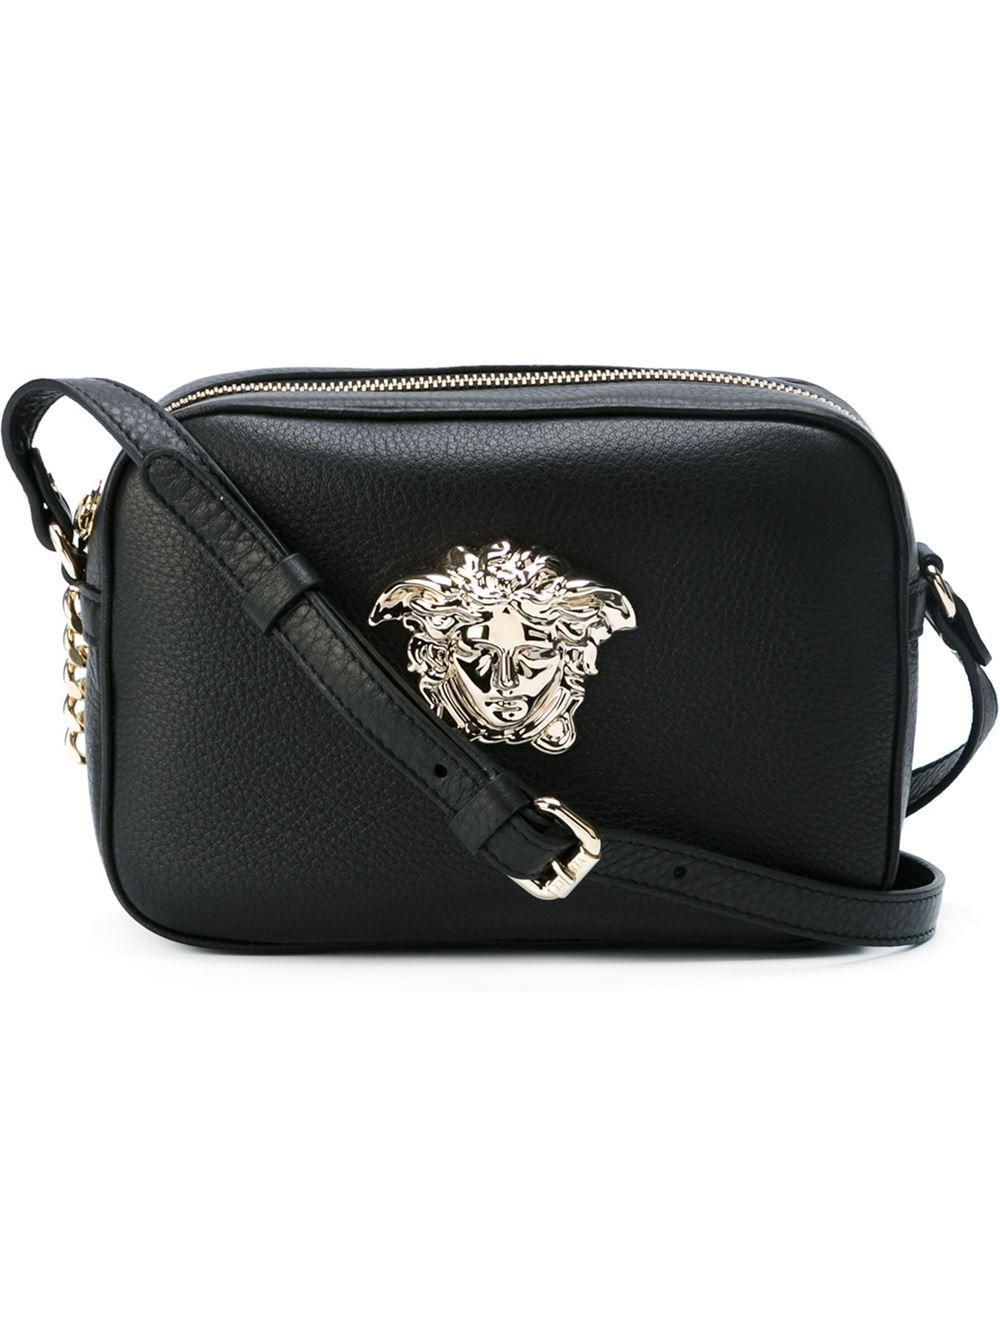 623ac6707a Versace // Medusa Crossbody Bag in Black   aesthetic. in 2019 ...